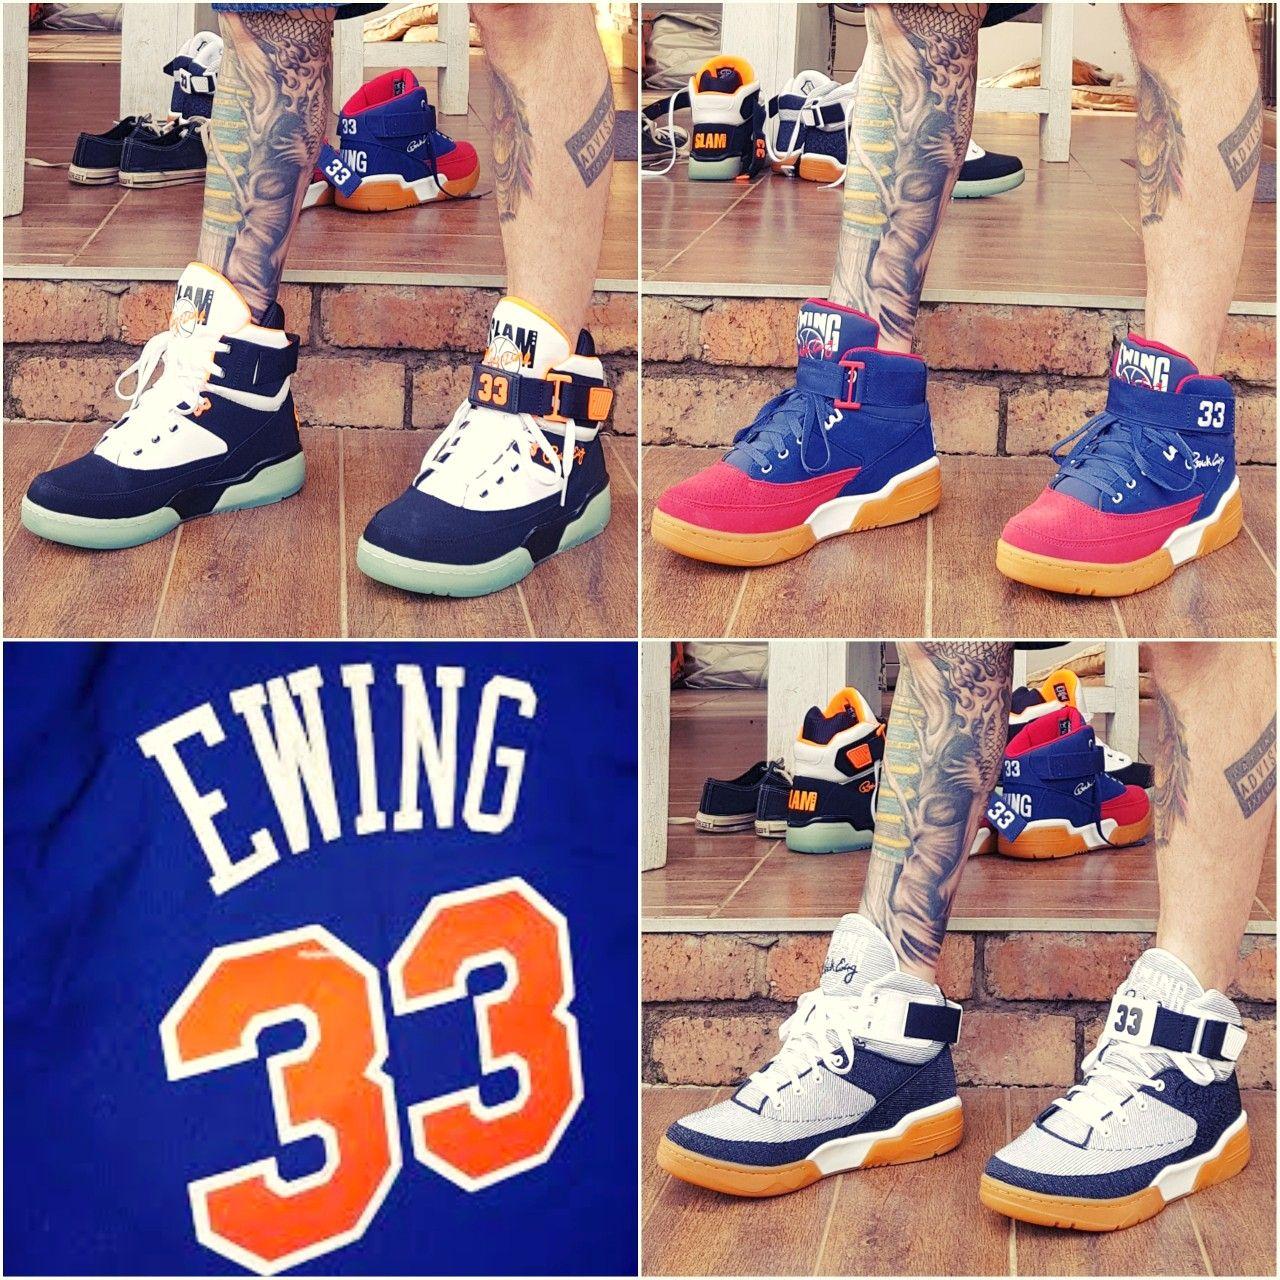 Patrick Ewings #33 Basketball - Happy